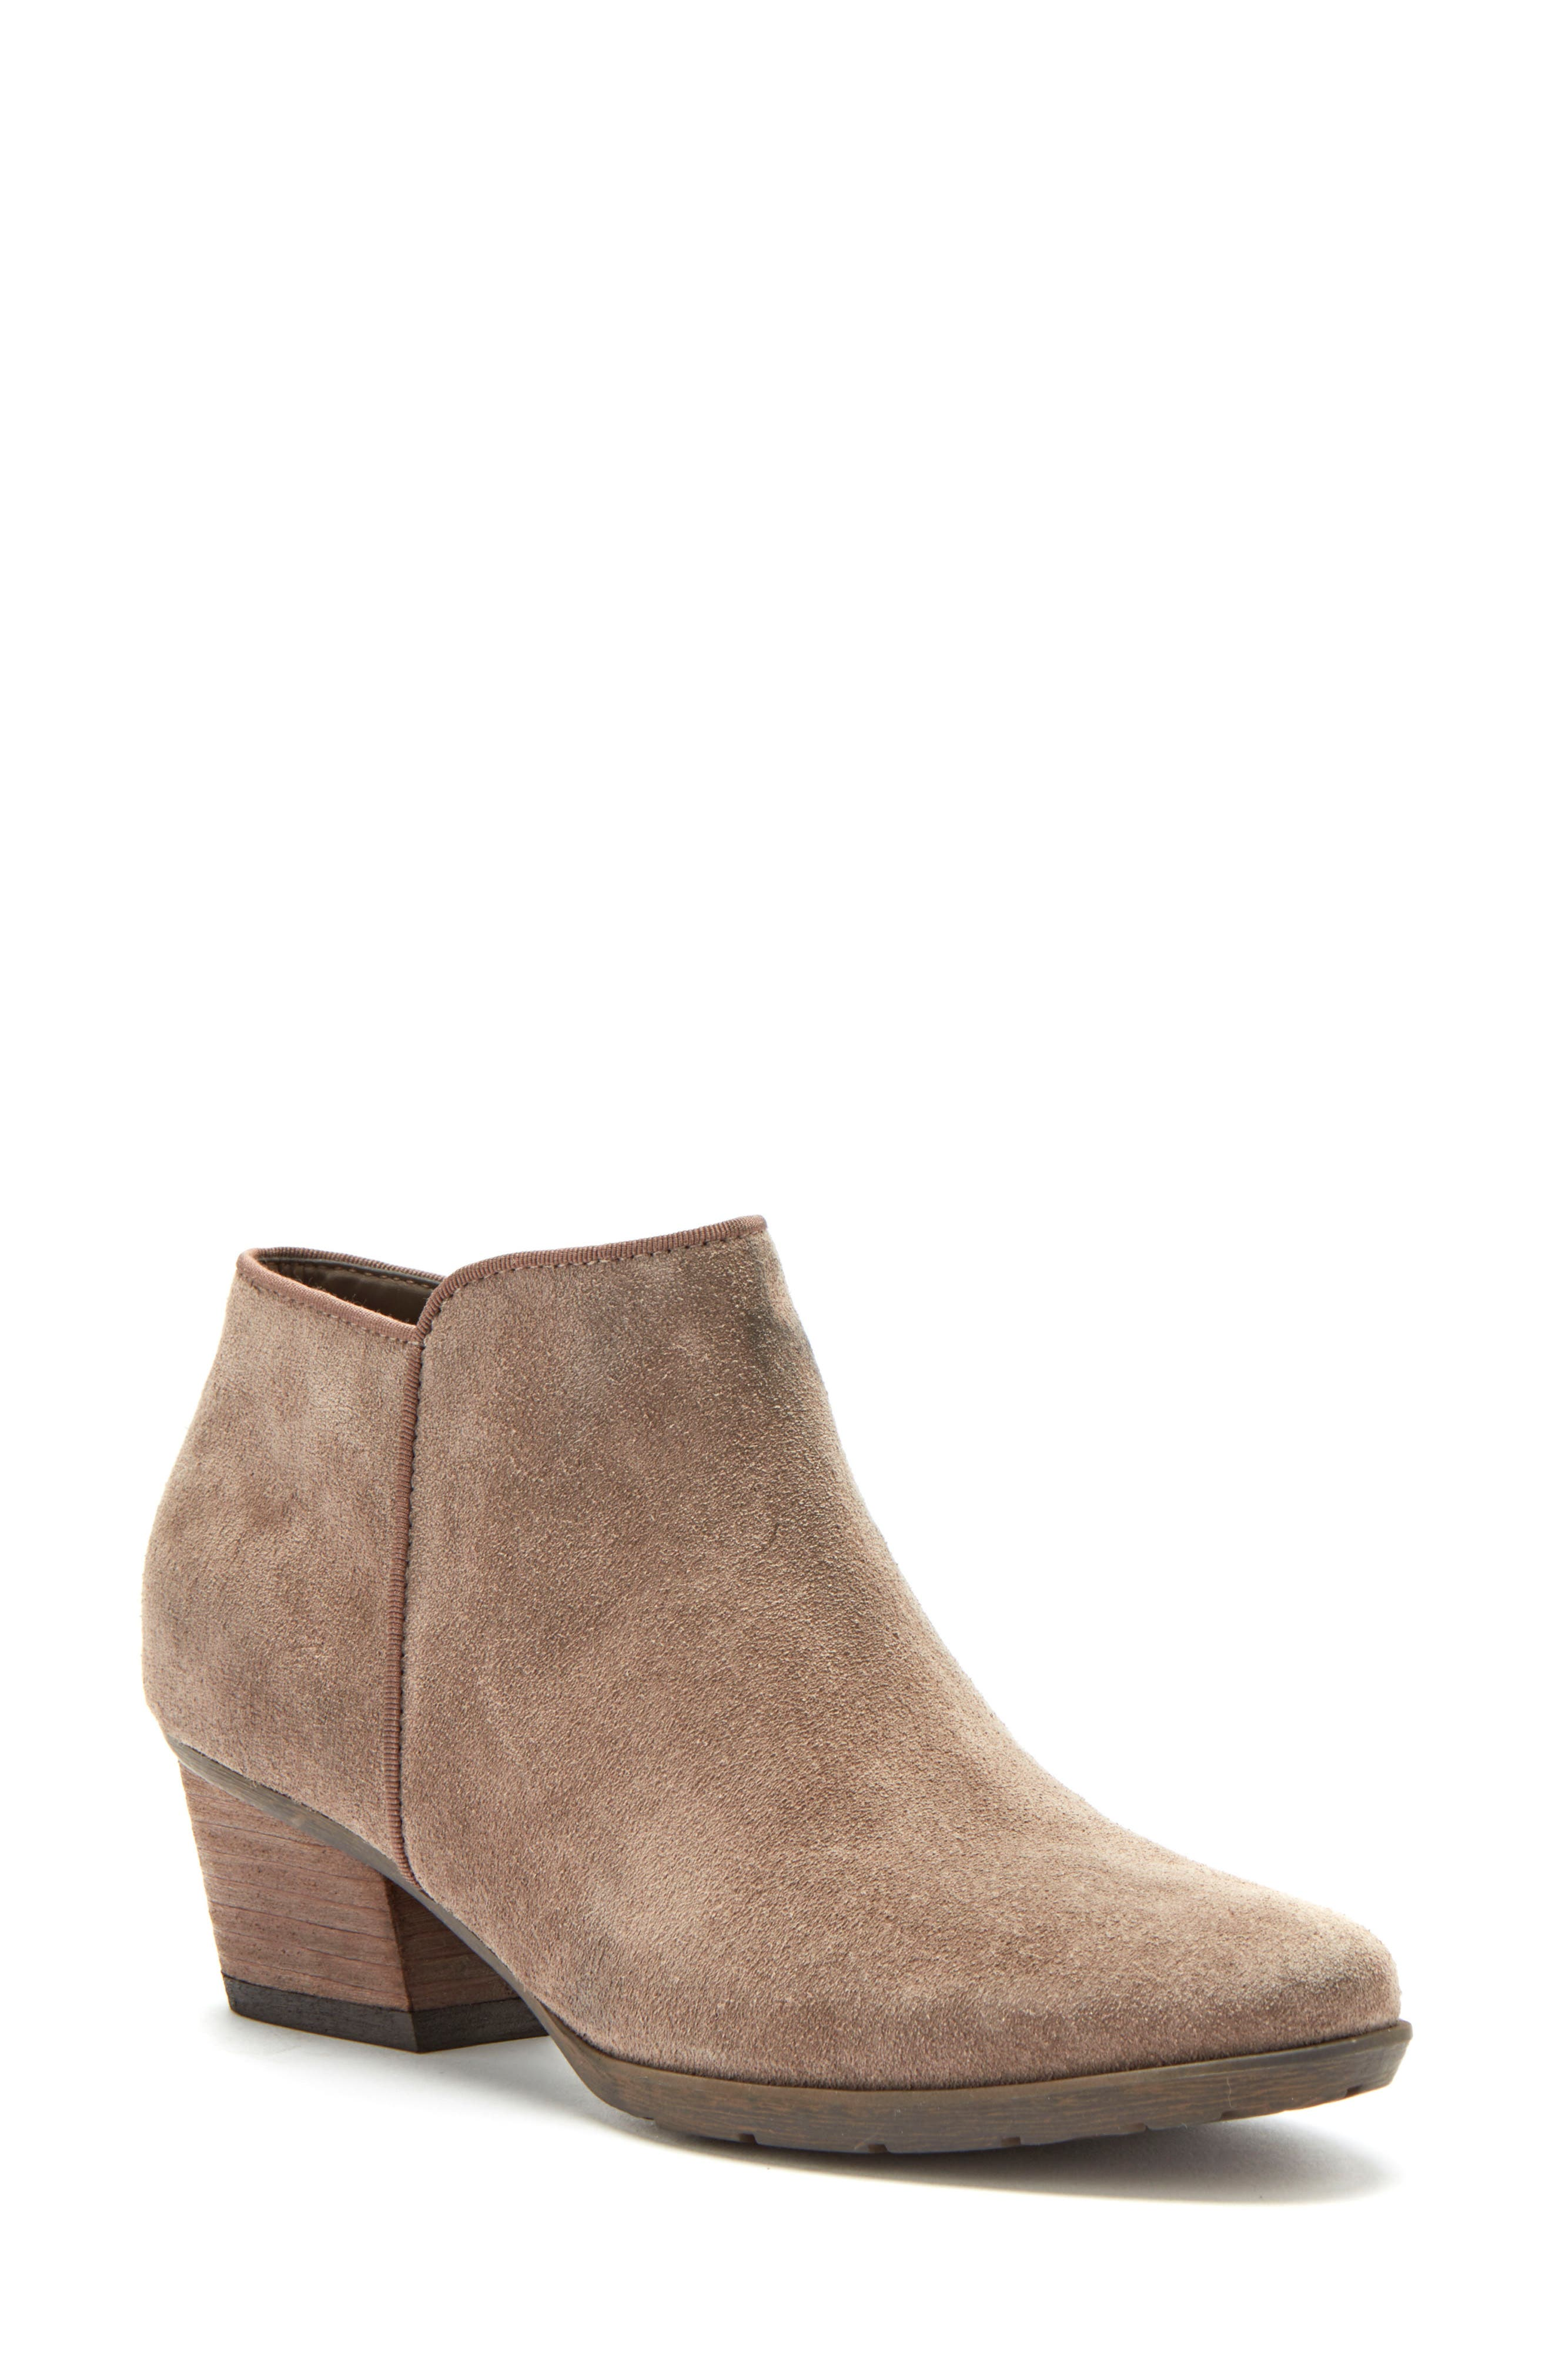 Womens Boots blondo black suede maddox waterproof ze6y43j6